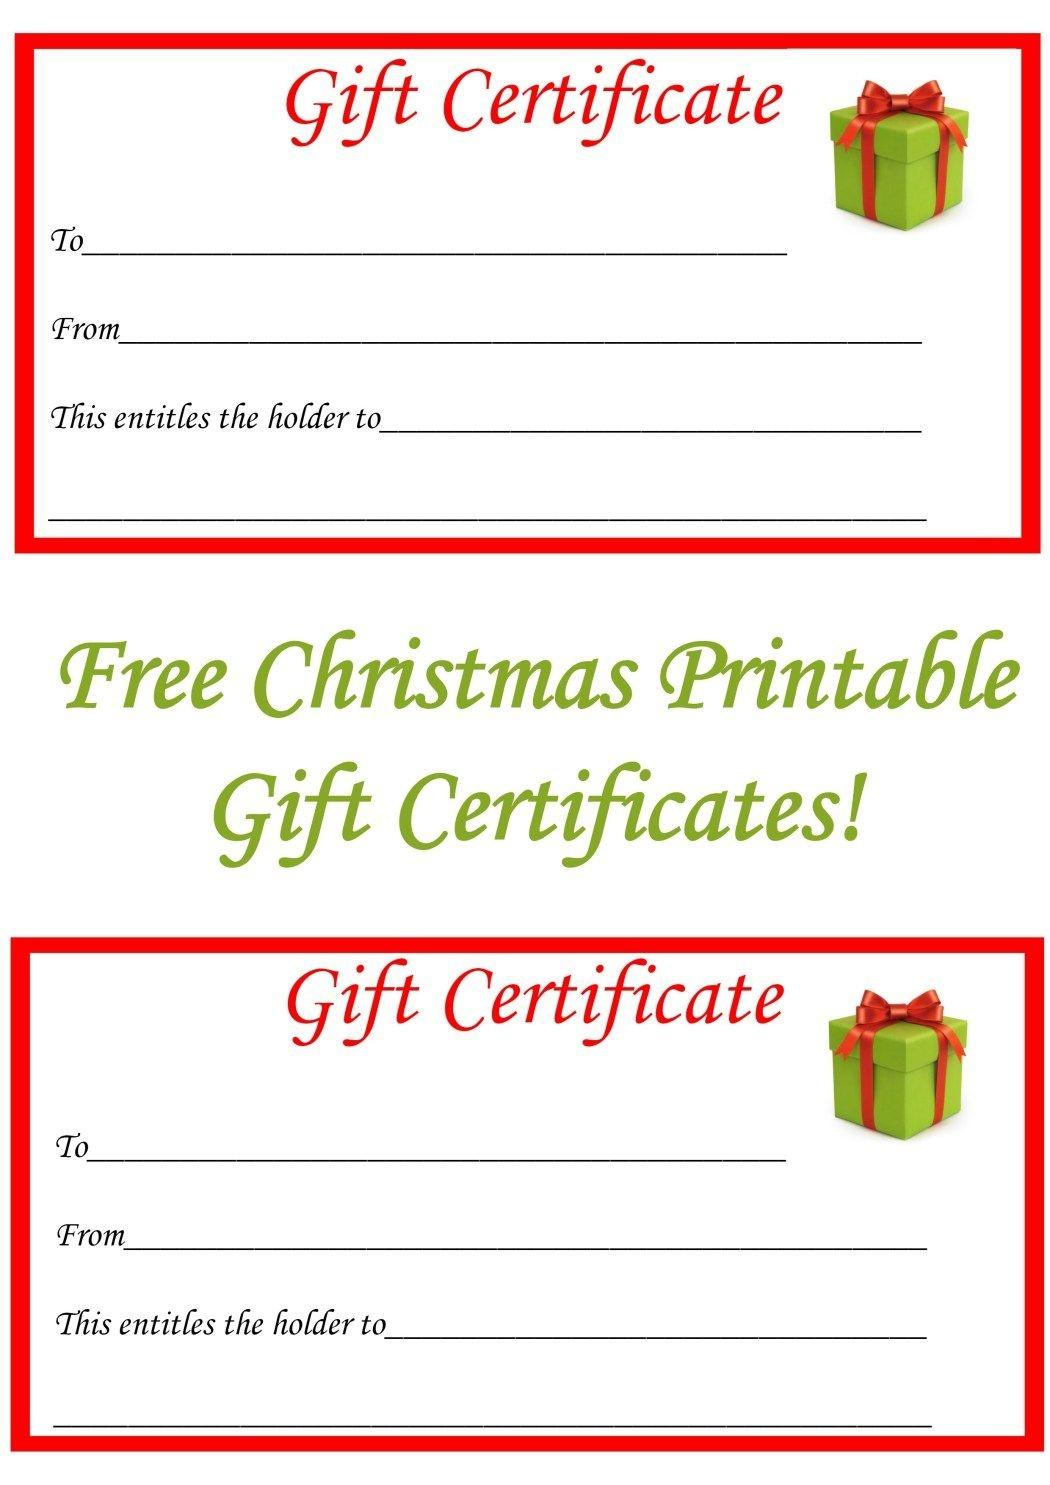 Free Christmas Printable Gift Certificates | Gift Ideas | Christmas - Free Printable Christmas Gift Voucher Templates